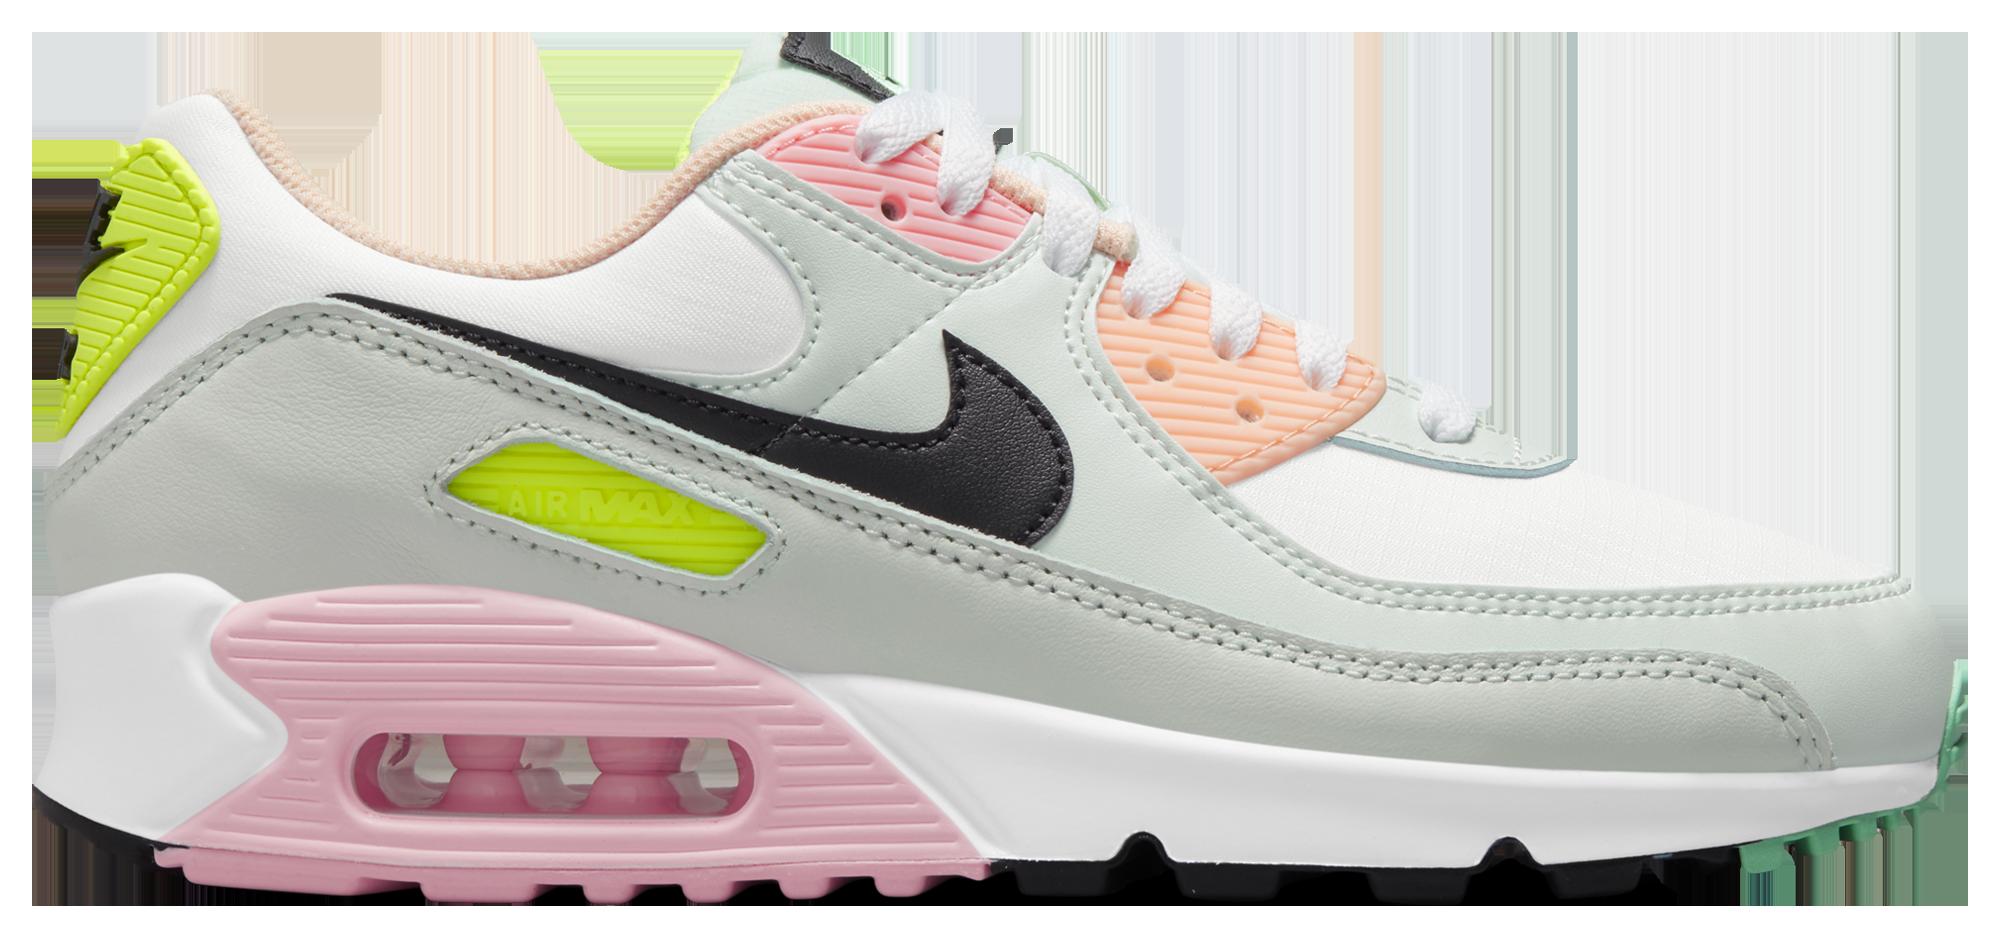 Nike Air Max 90 - Women's | Foot Locker